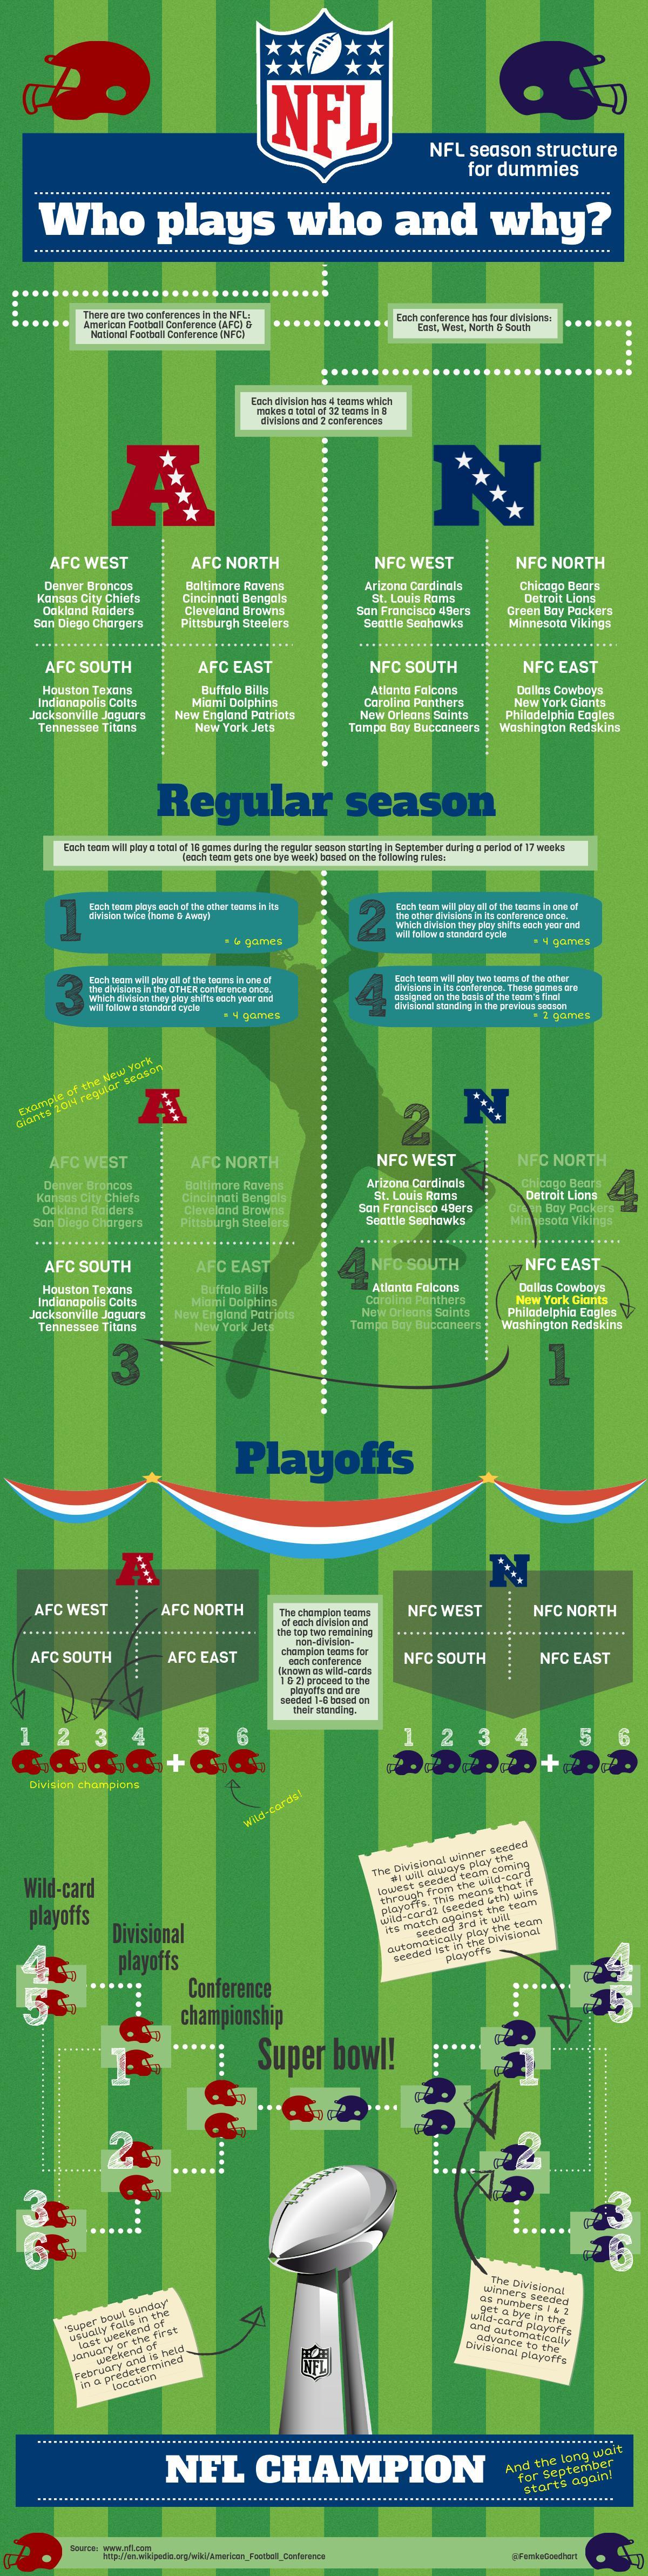 NFL Season structure